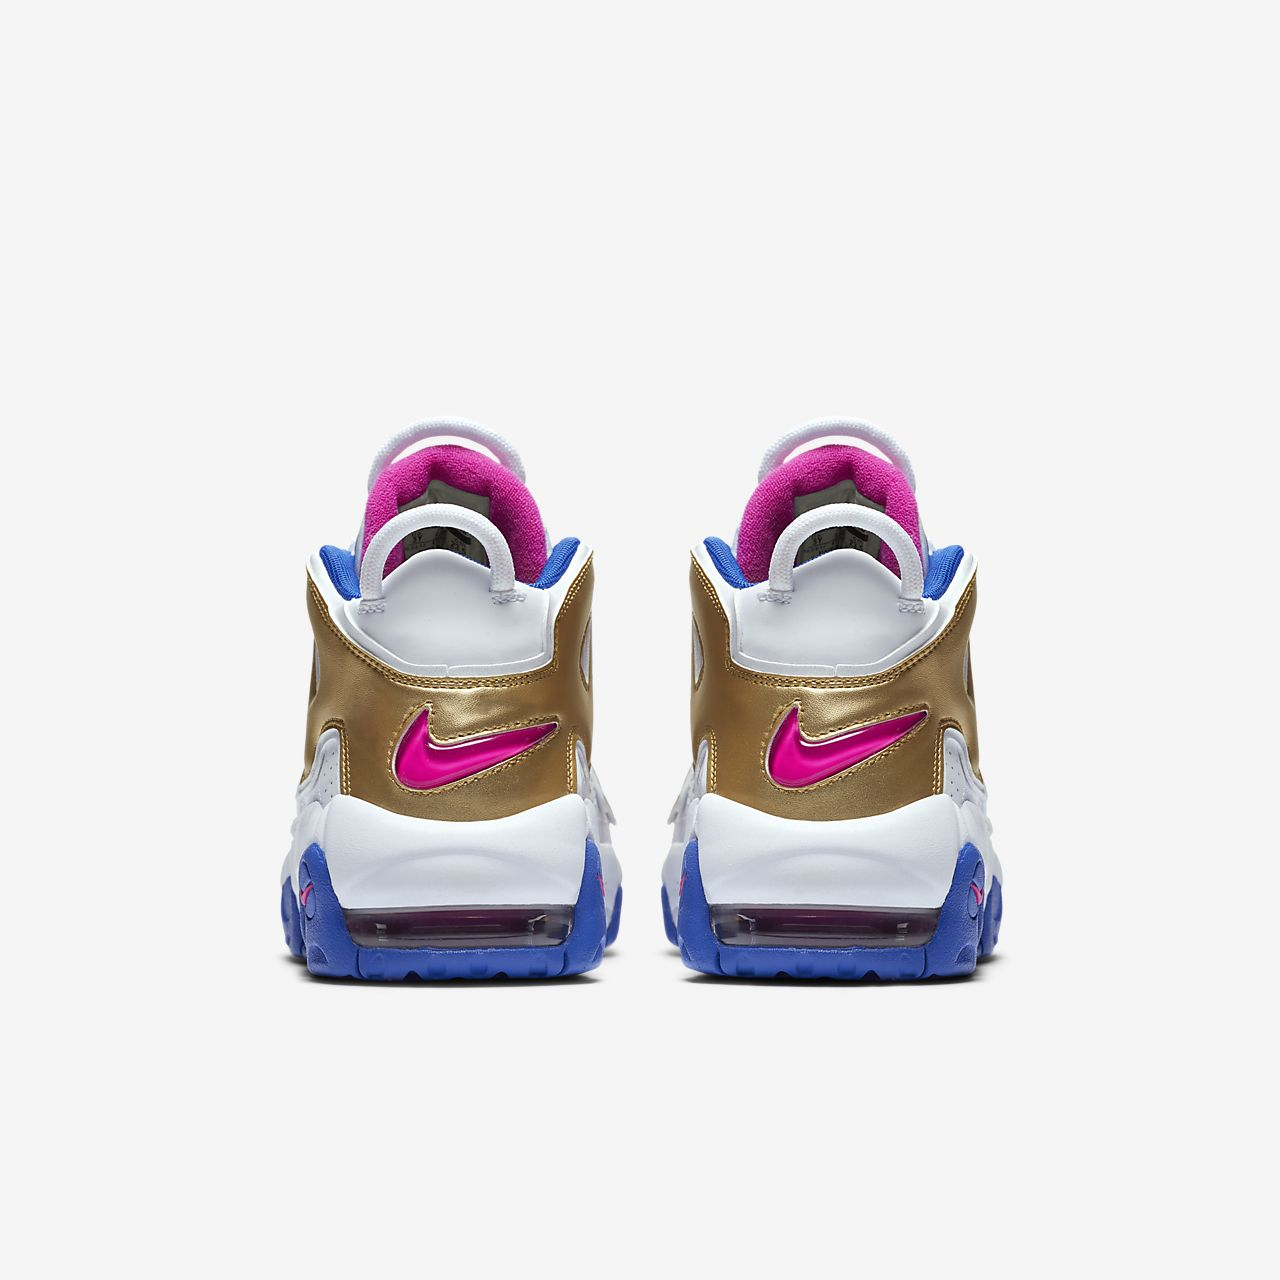 ... Nike Air More Uptempo Big Kids' Shoe